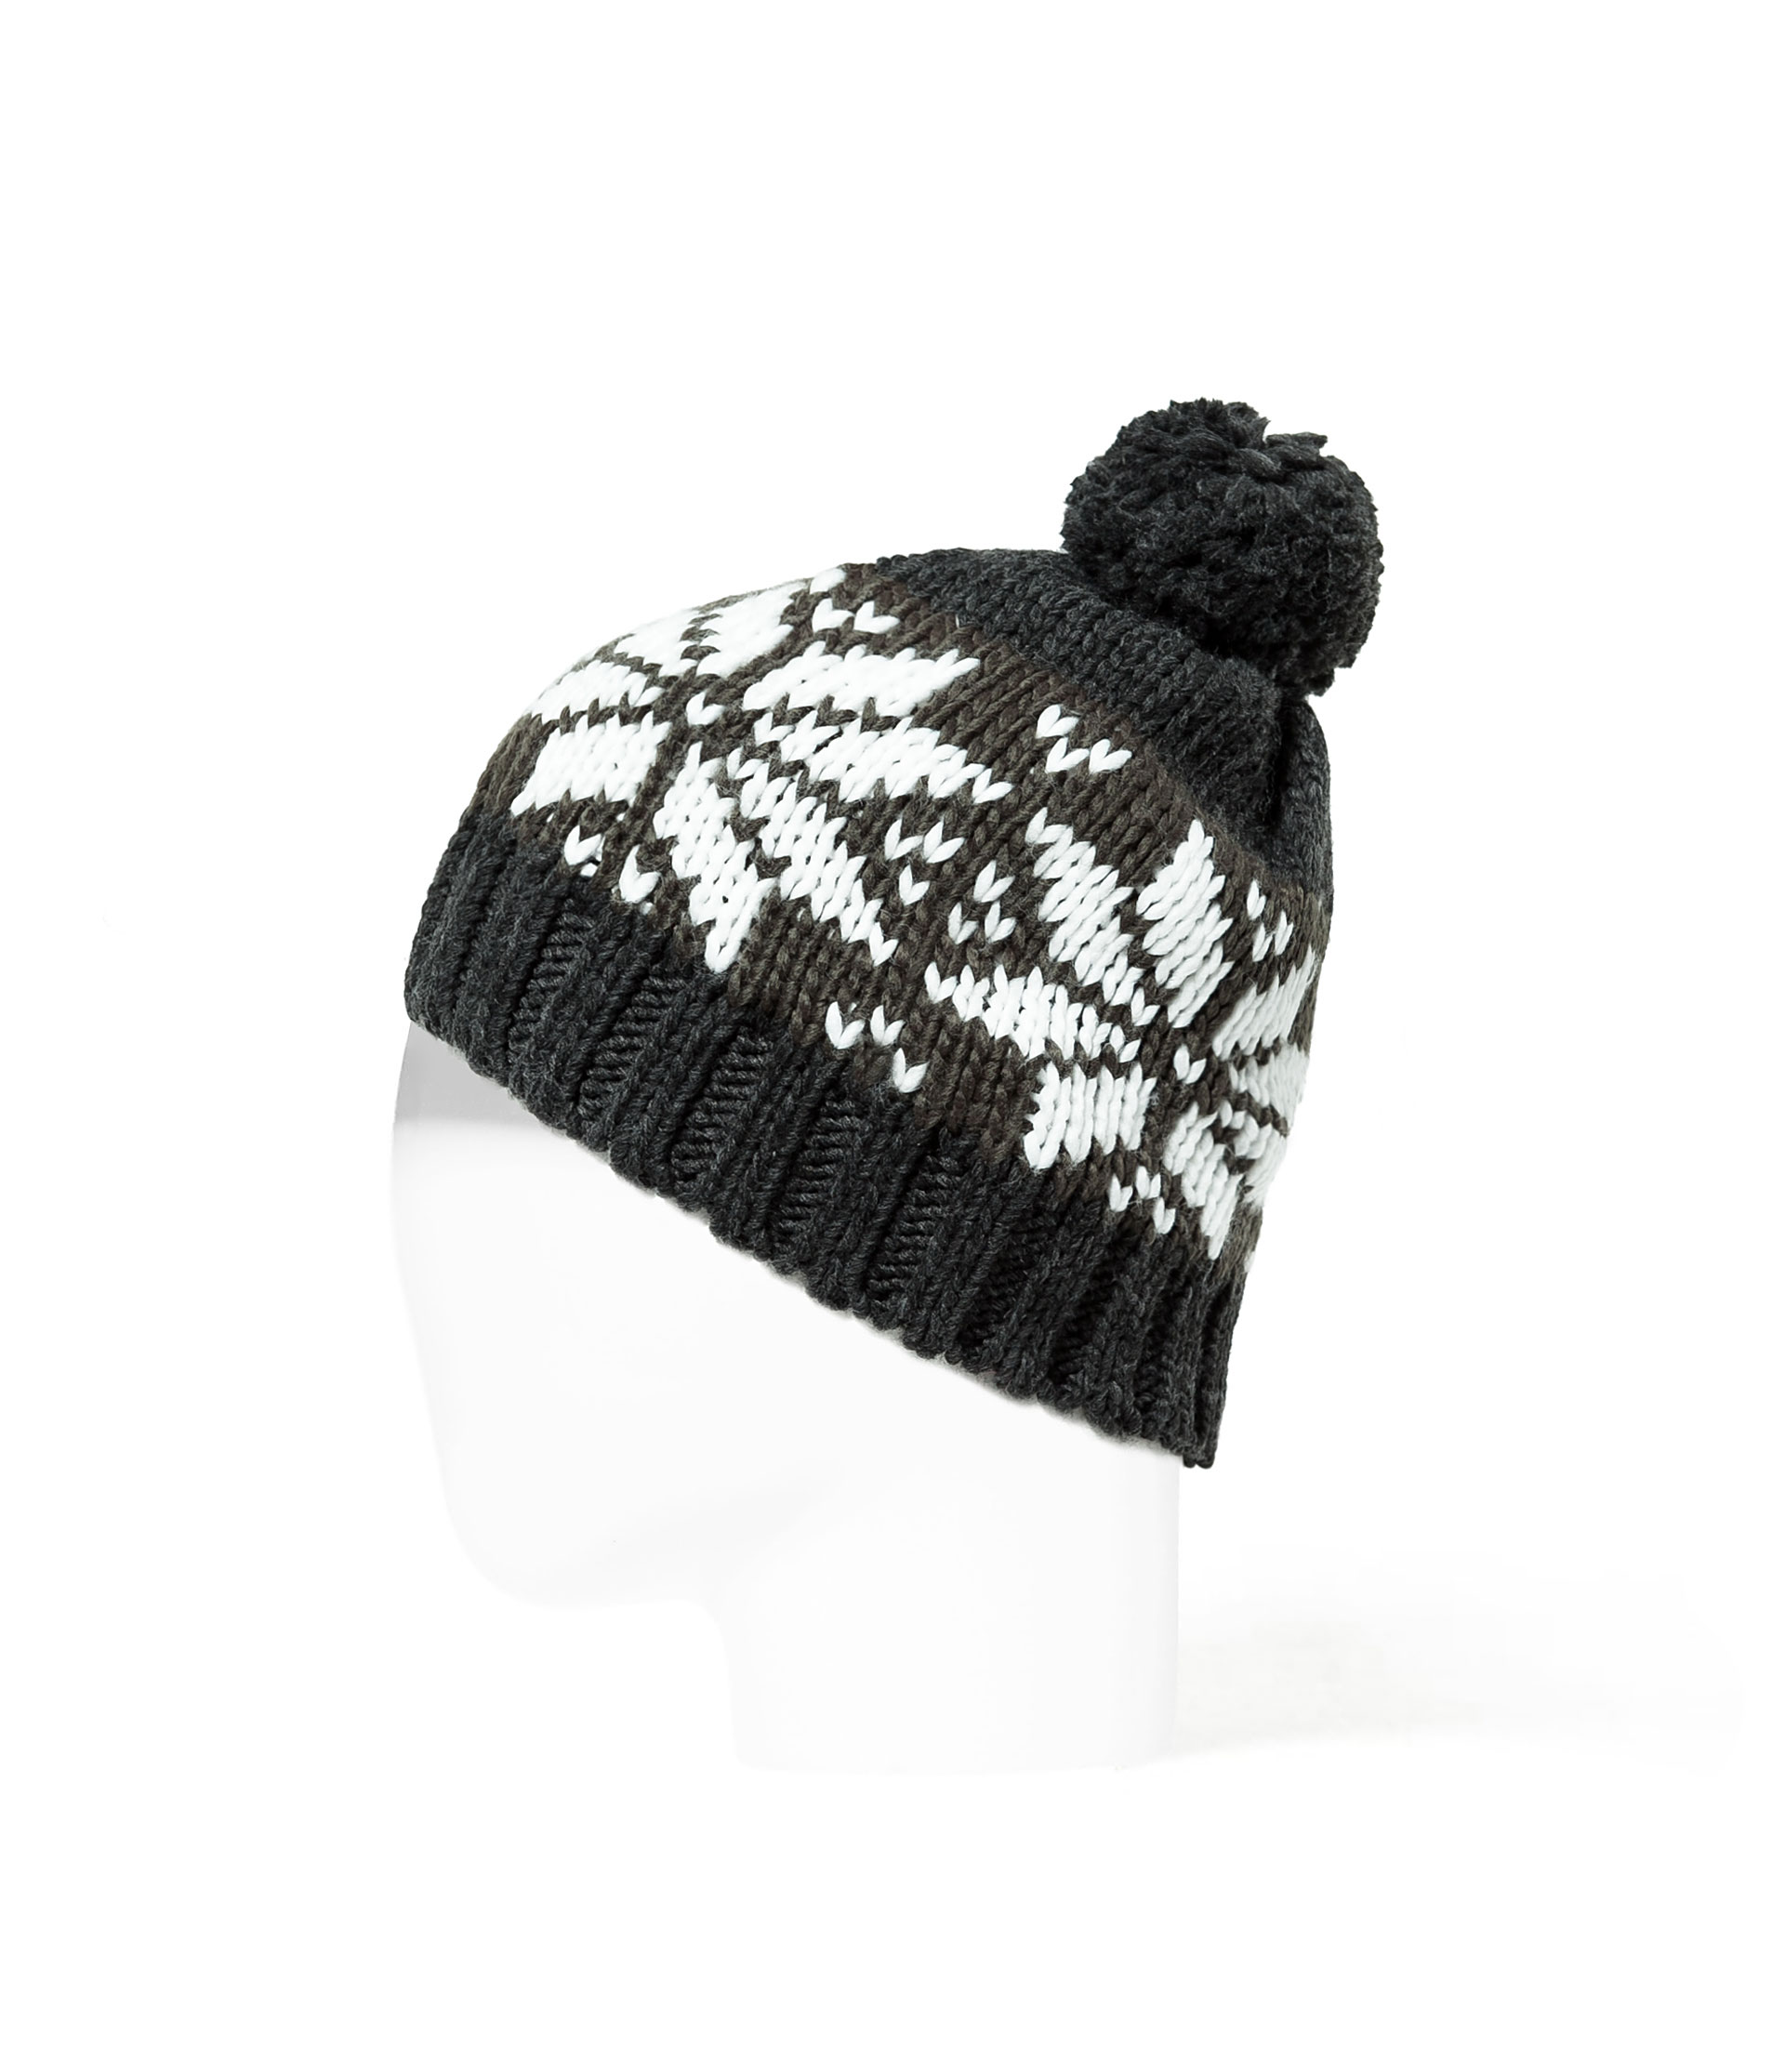 Zara Bobble Jacquard Pattern Knitted Hat: £12.99